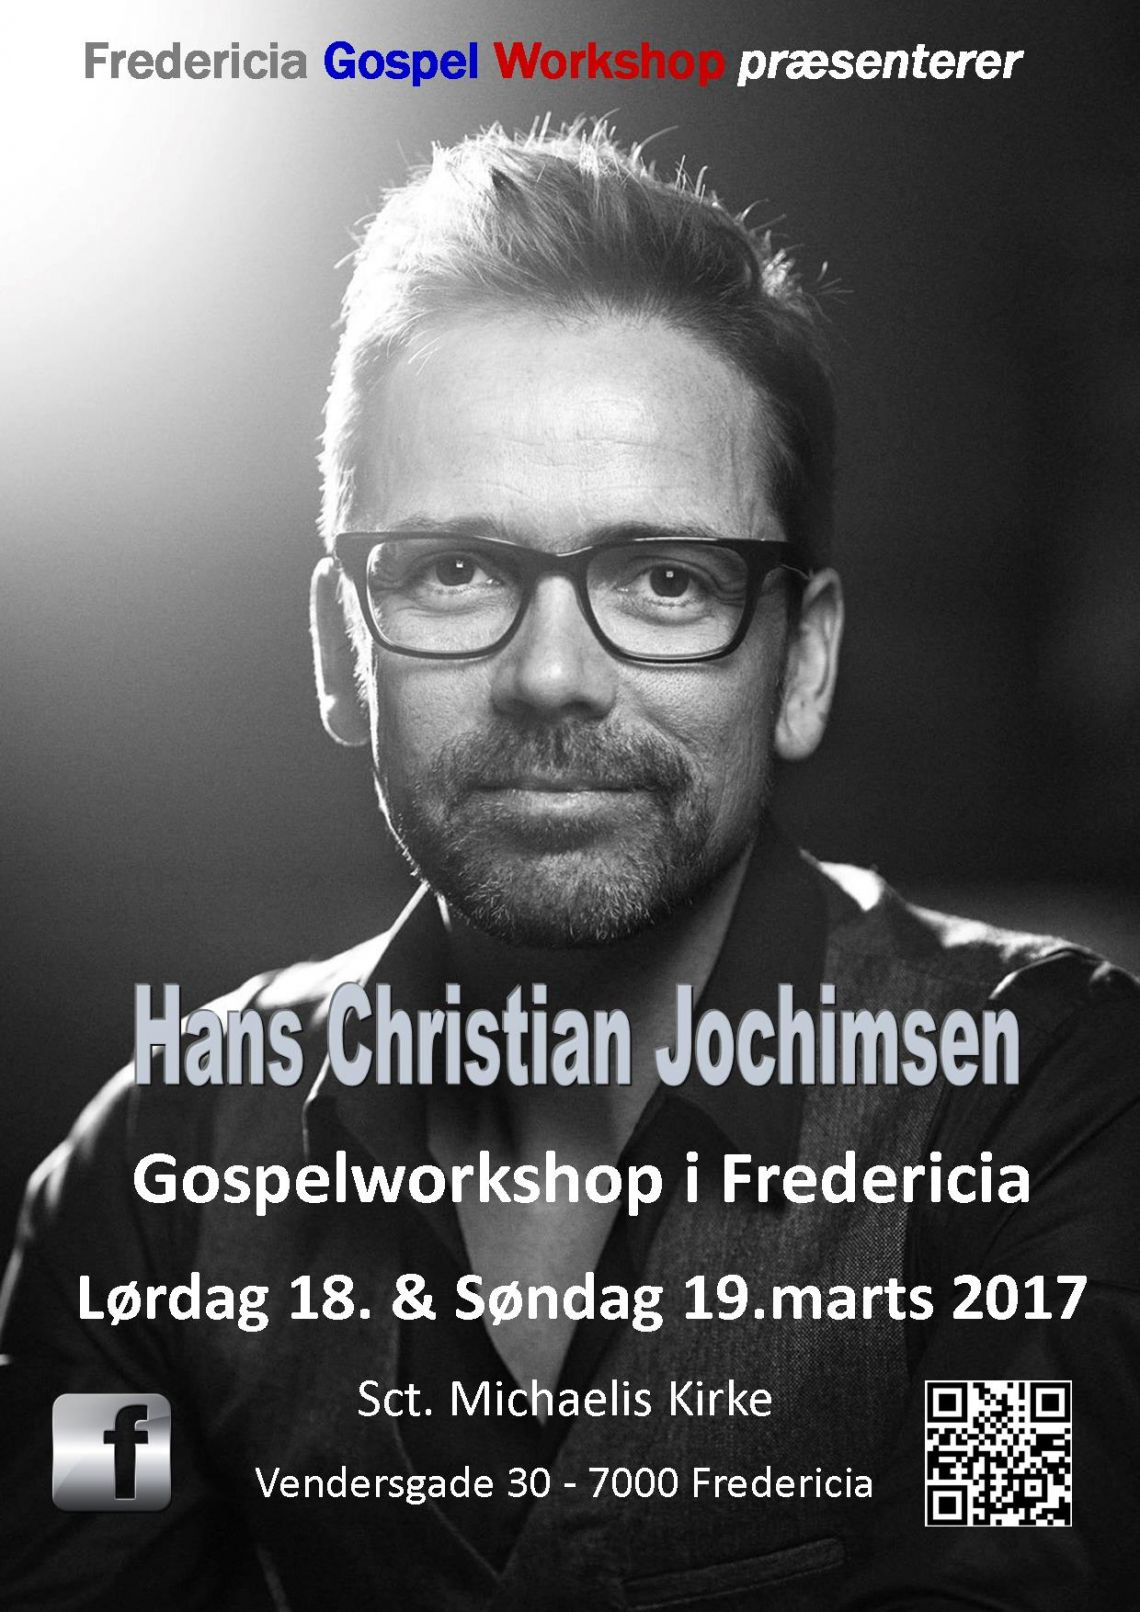 Fredericia Gospel Workshop 2017